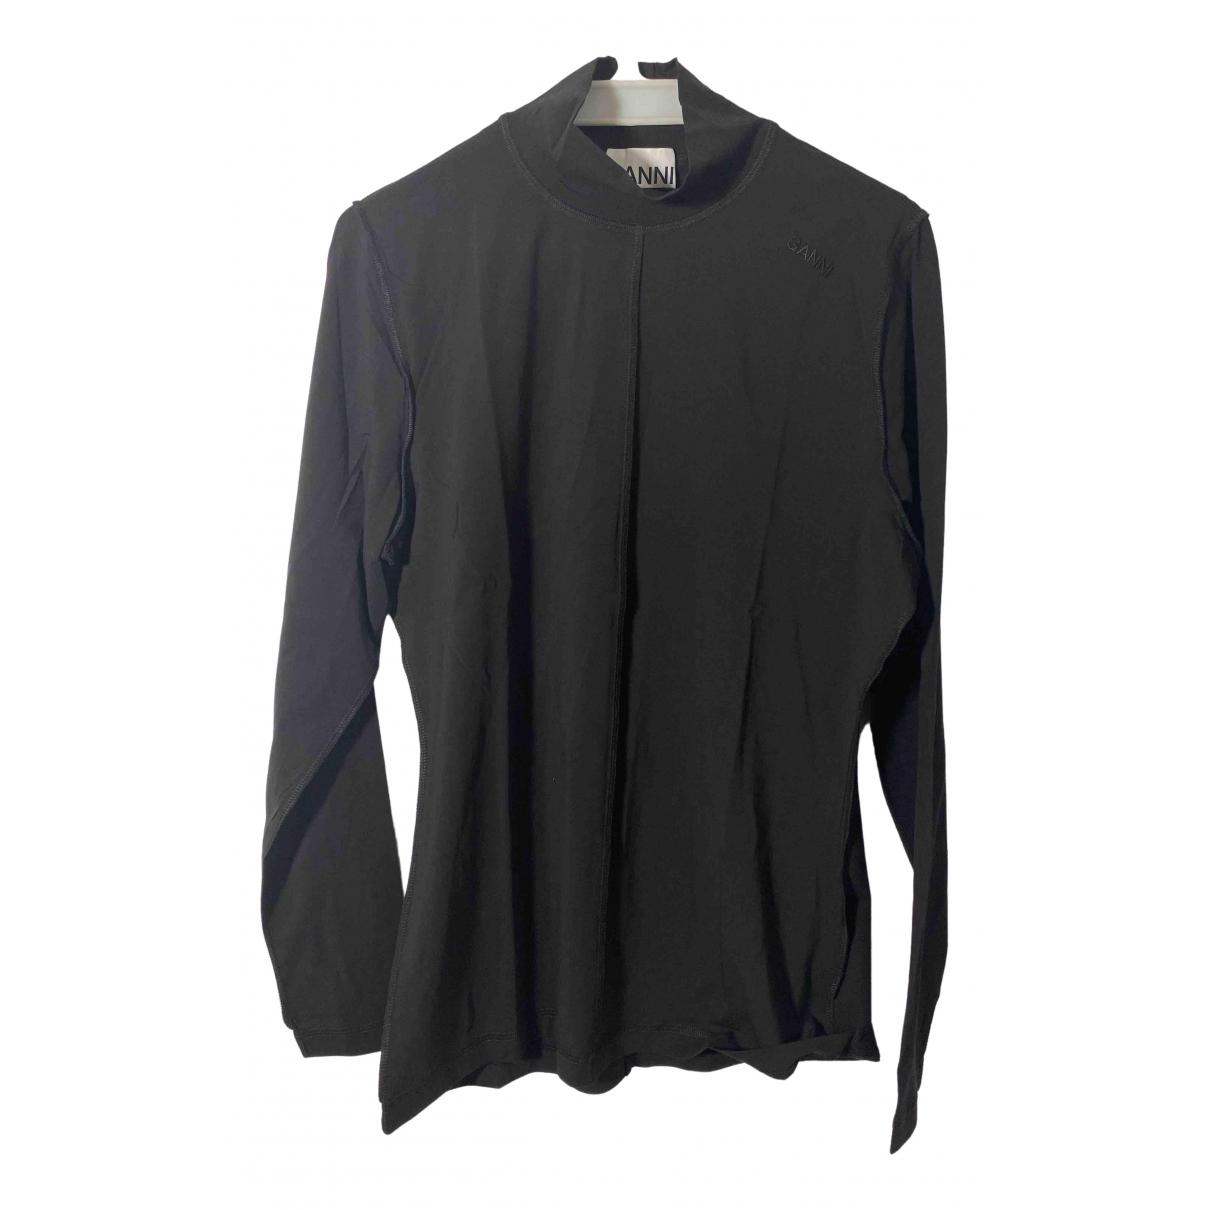 Ganni Fall Winter 2019 Black Cotton Knitwear for Women 42 FR